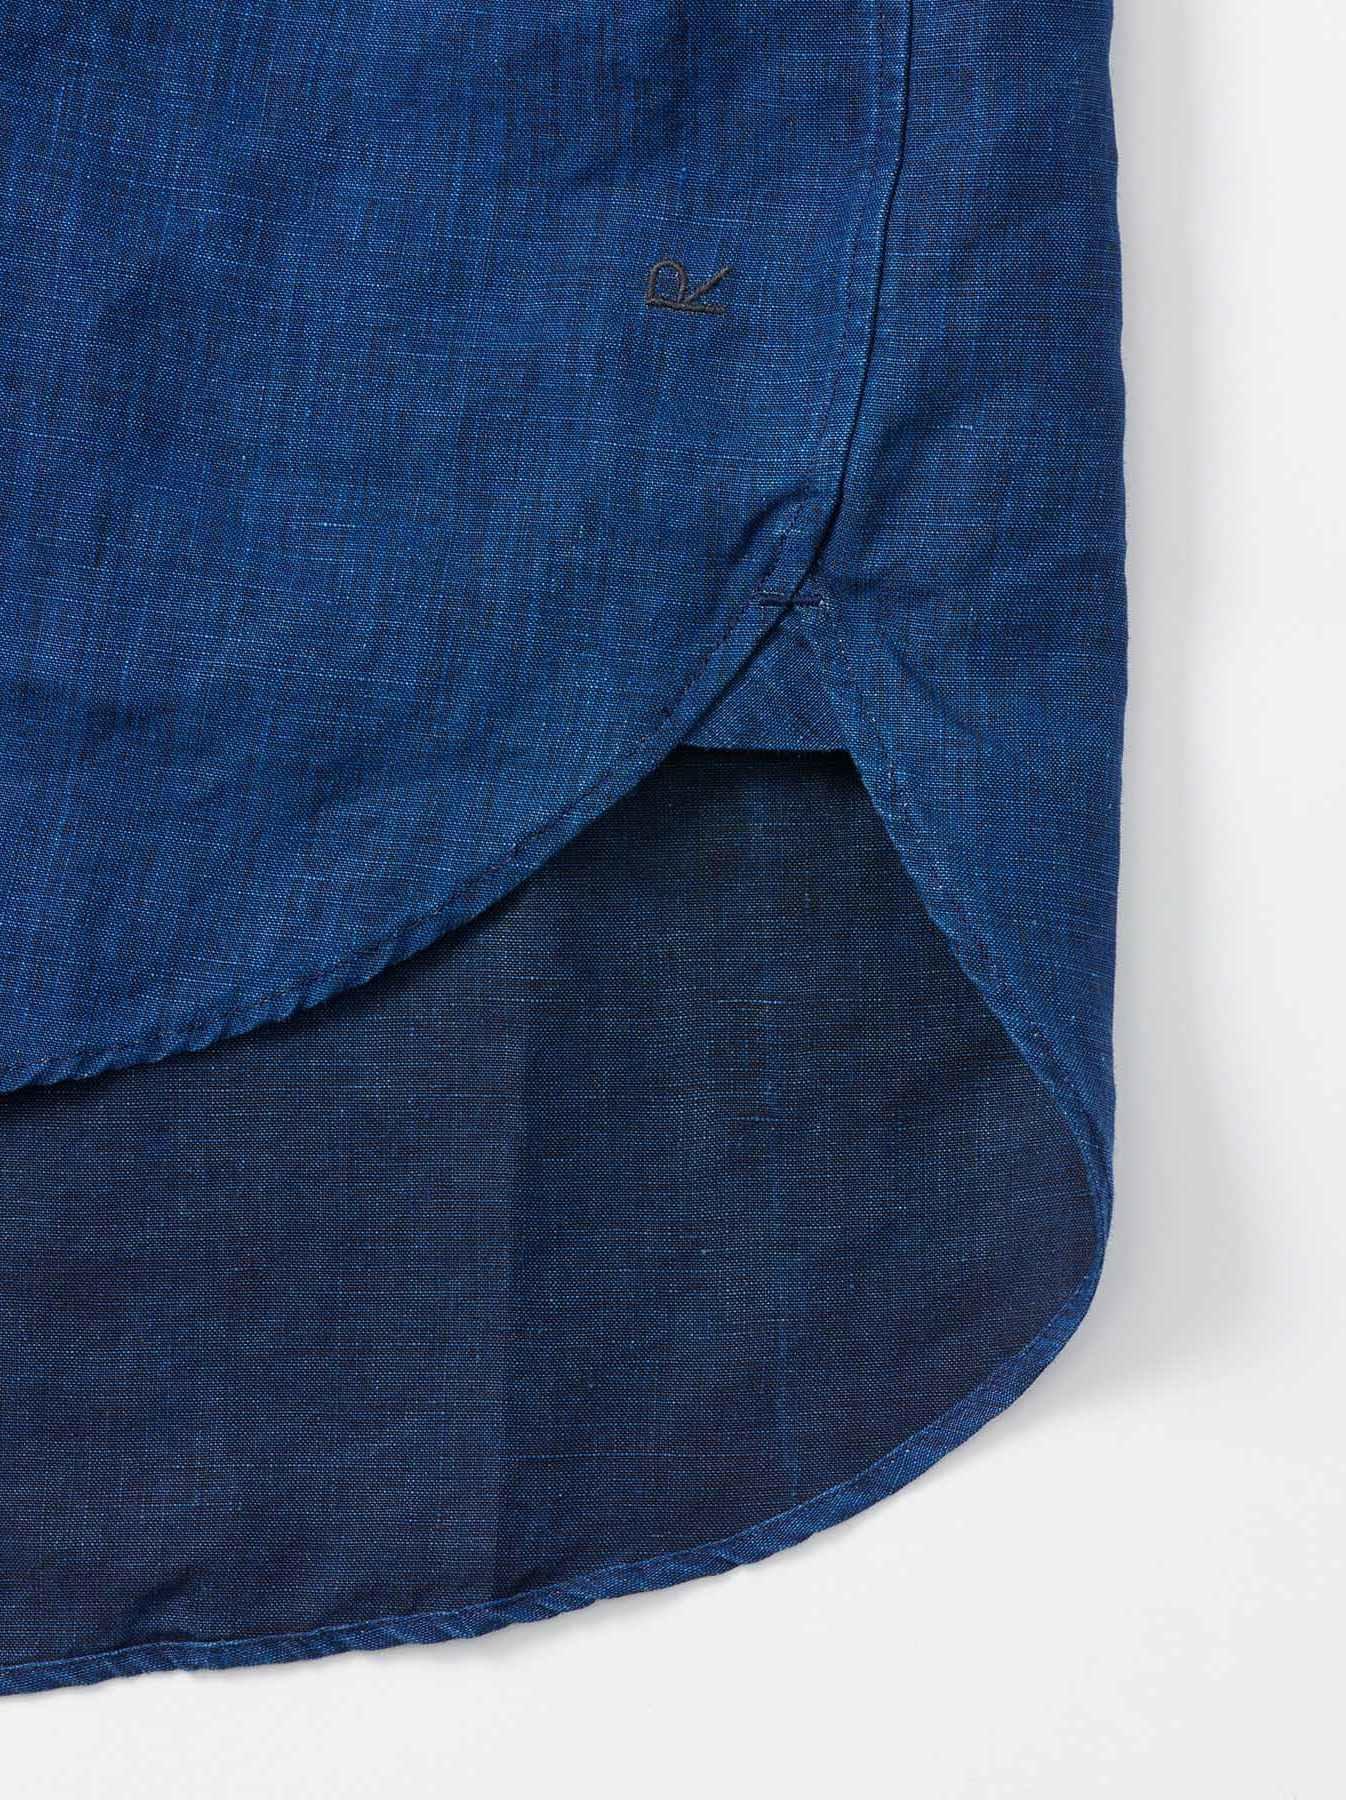 WH Indigo Linen Pin-tuck 908 Shirt-10